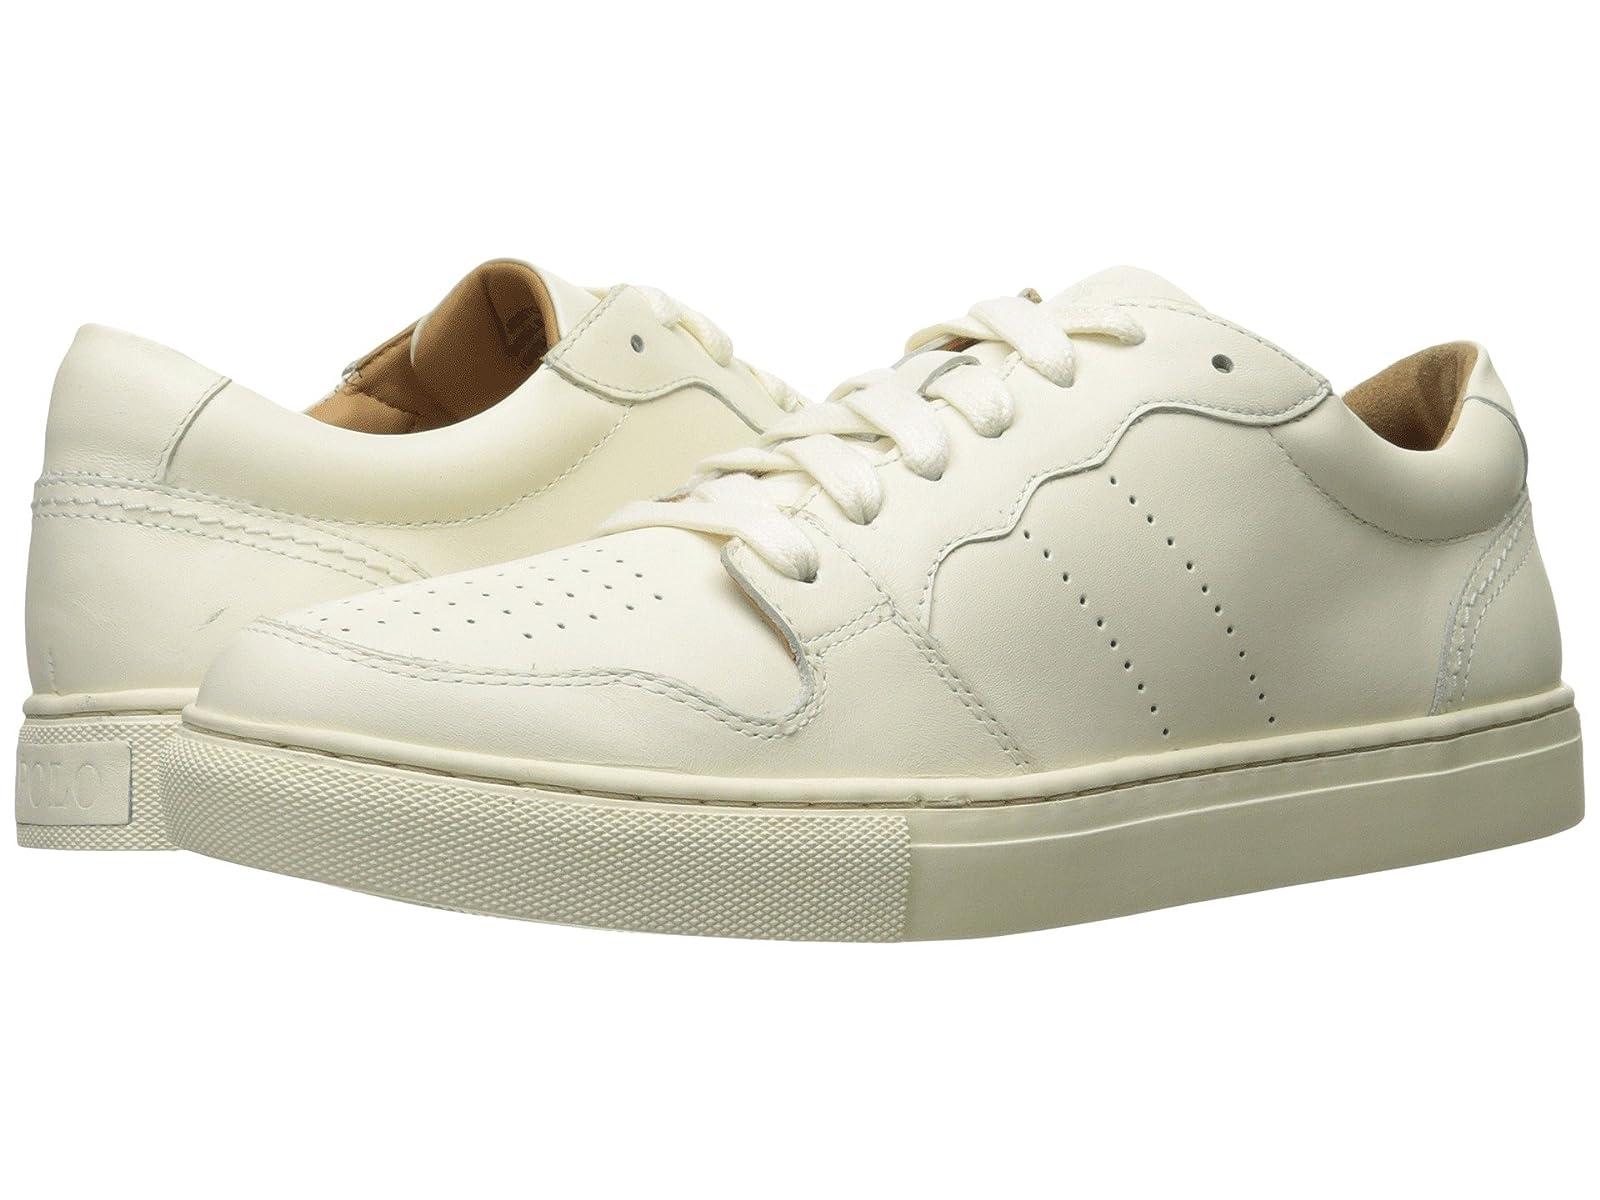 Polo Ralph Lauren JestonCheap and distinctive eye-catching shoes